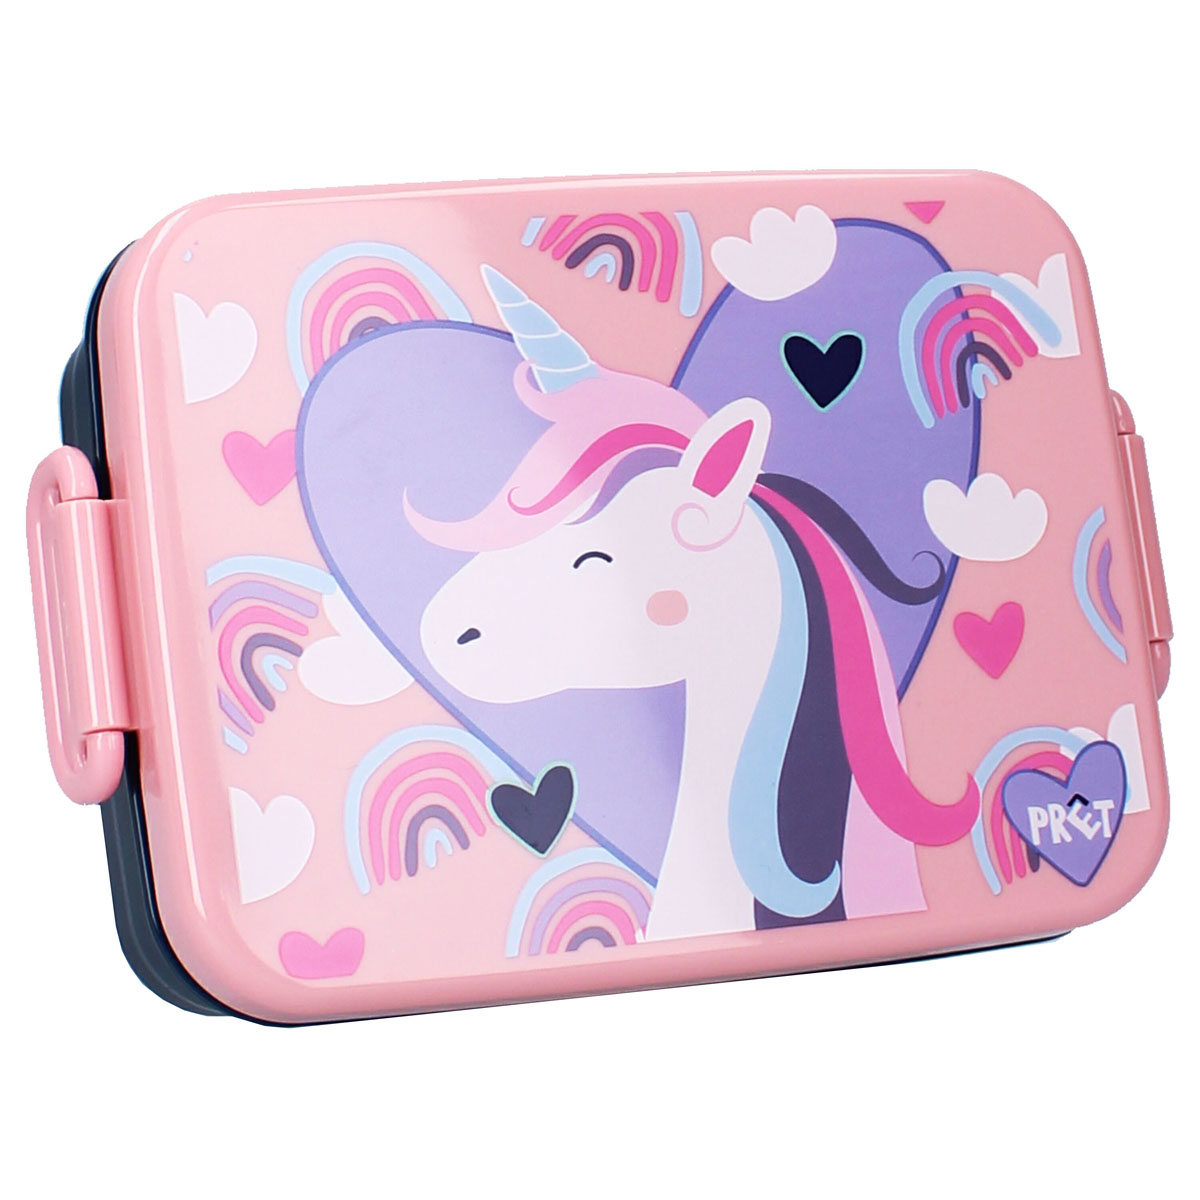 Lunch box \'Licorne My Unicorn\' rose - 16x13x5 cm - [A3069]